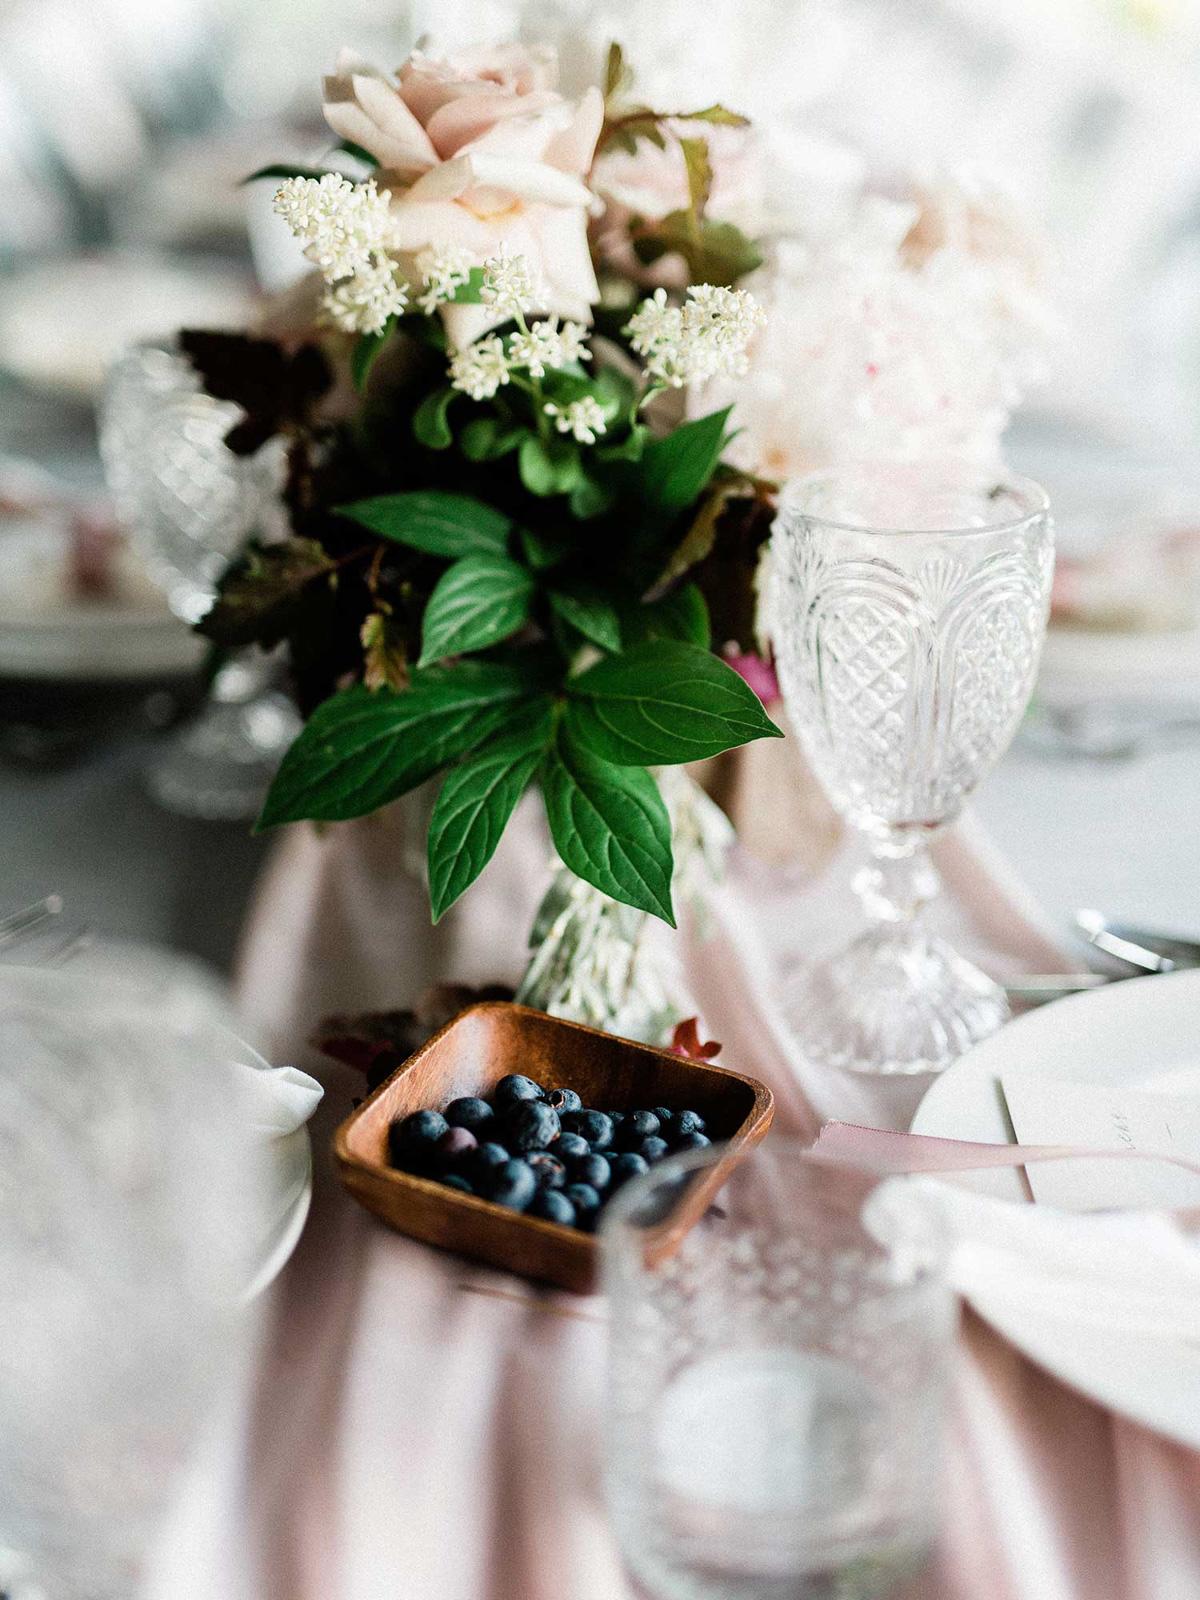 destiny-dawn-photography-vineyard-bride-swish-list-knollwood-golf-and-country-club-ancaster-wedding-editorial-43.jpg